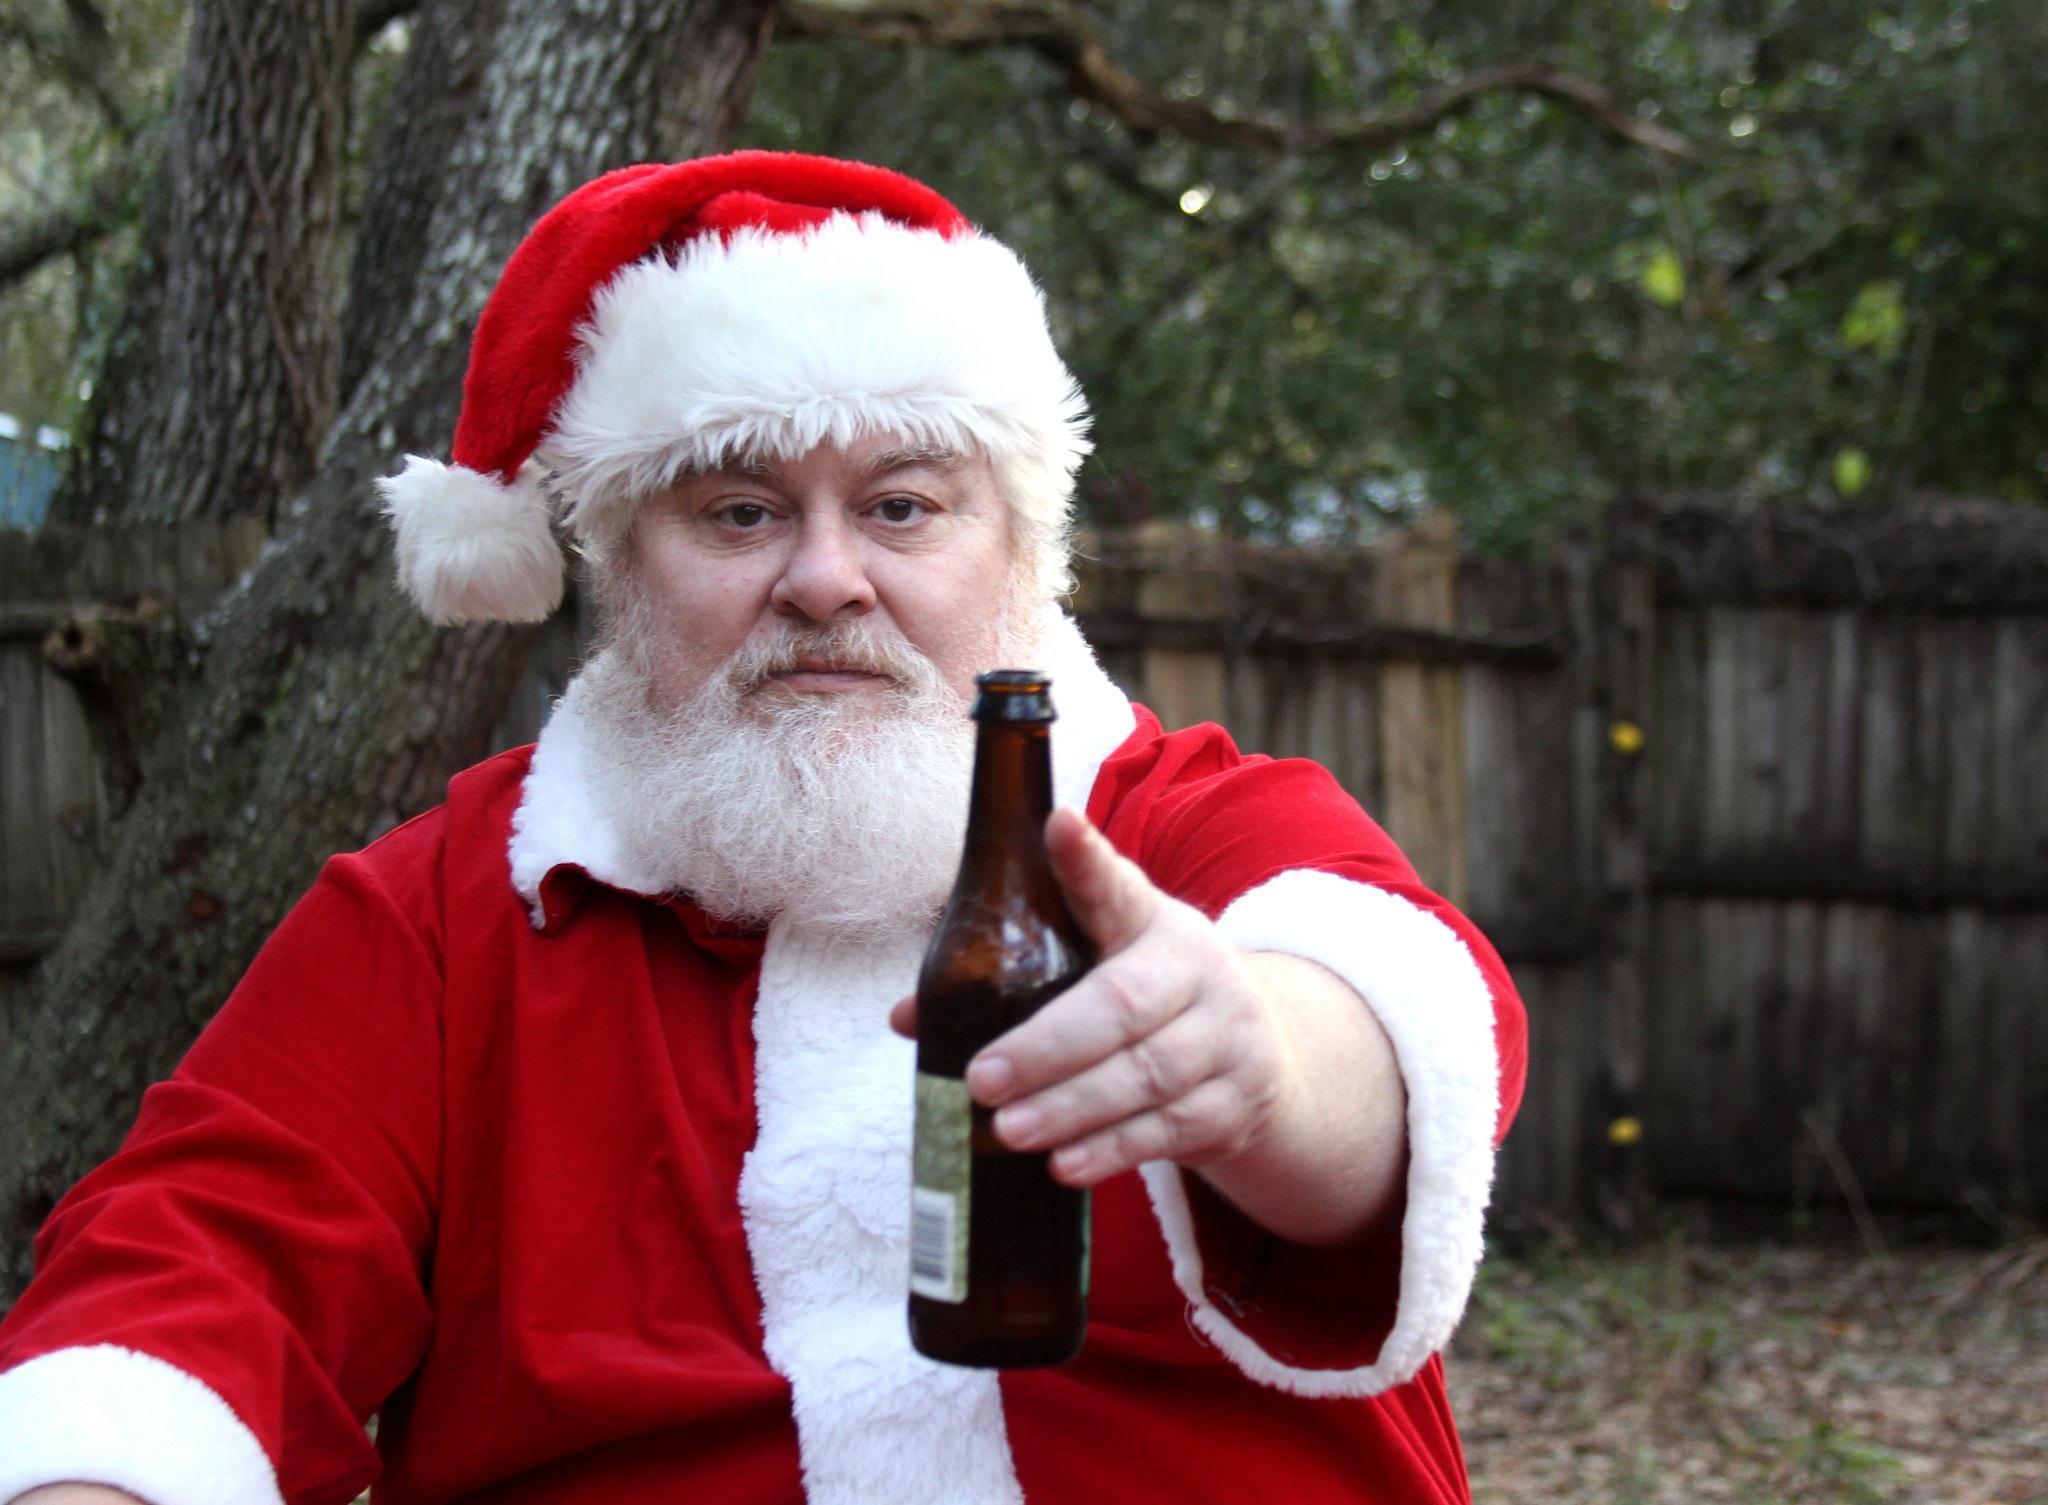 Christmas Liquor.Hoosiers Can Finally Buy Liquor On Christmas If They Can